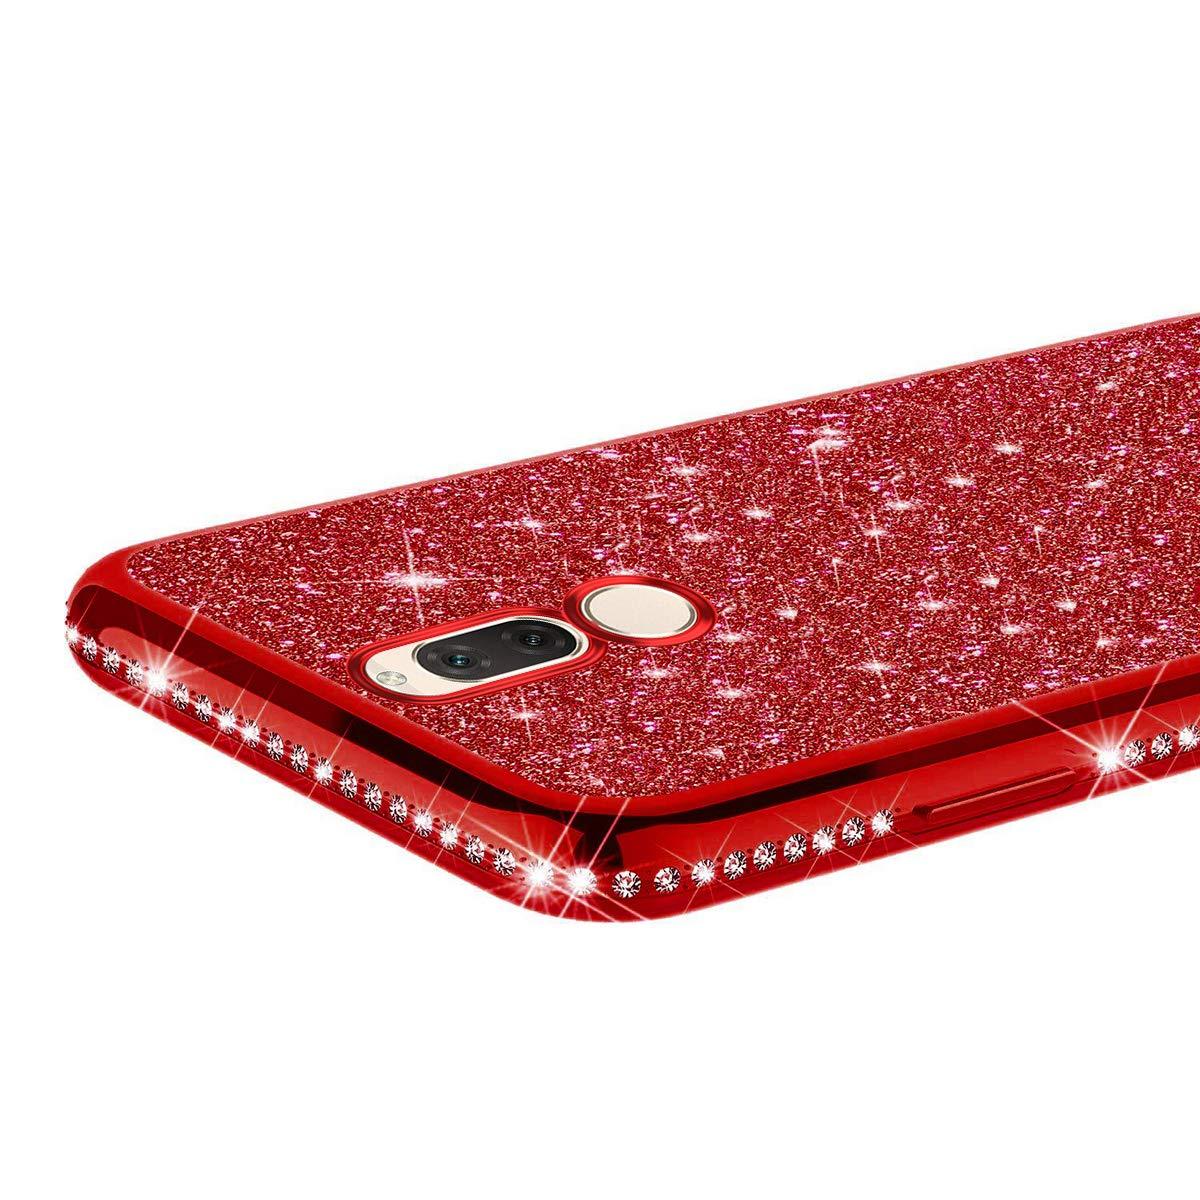 JAWSEU Funda Brillante Brillo Compatible con Huawei Mate 9 Carcasa Purpurina Bling Glitter Diamantes Suave Silicona TPU Gel Cubierta Ultra Delgado Enchapado Goma Protectora Funda Case,Roja